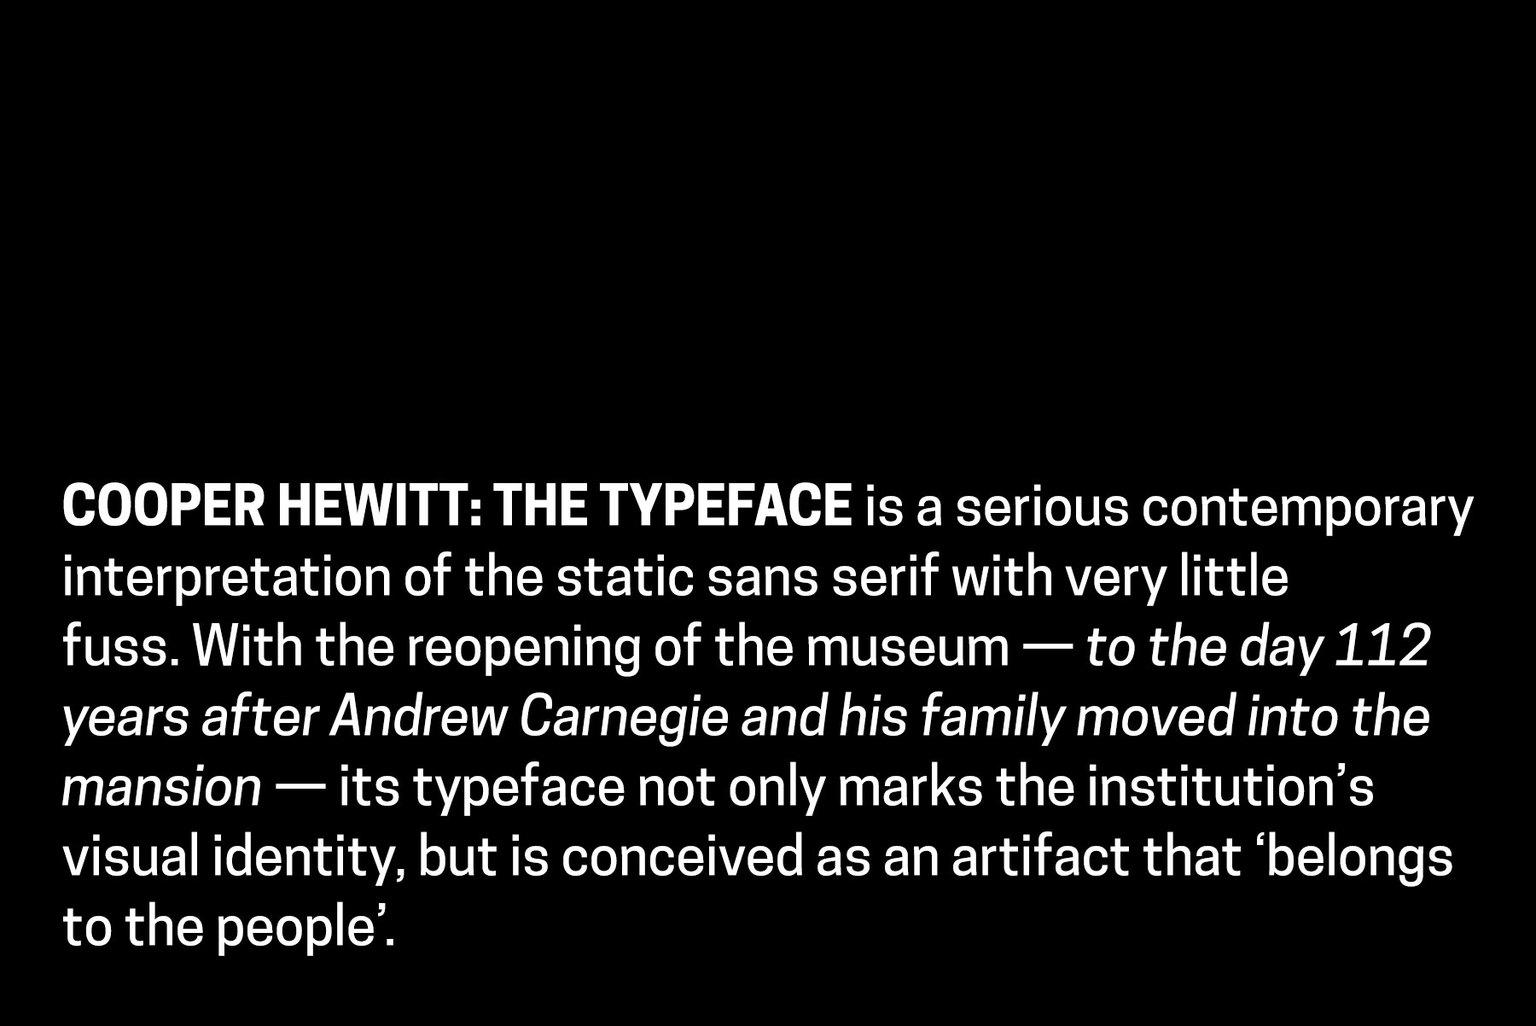 Vllg constellation cooperhewitt typographica